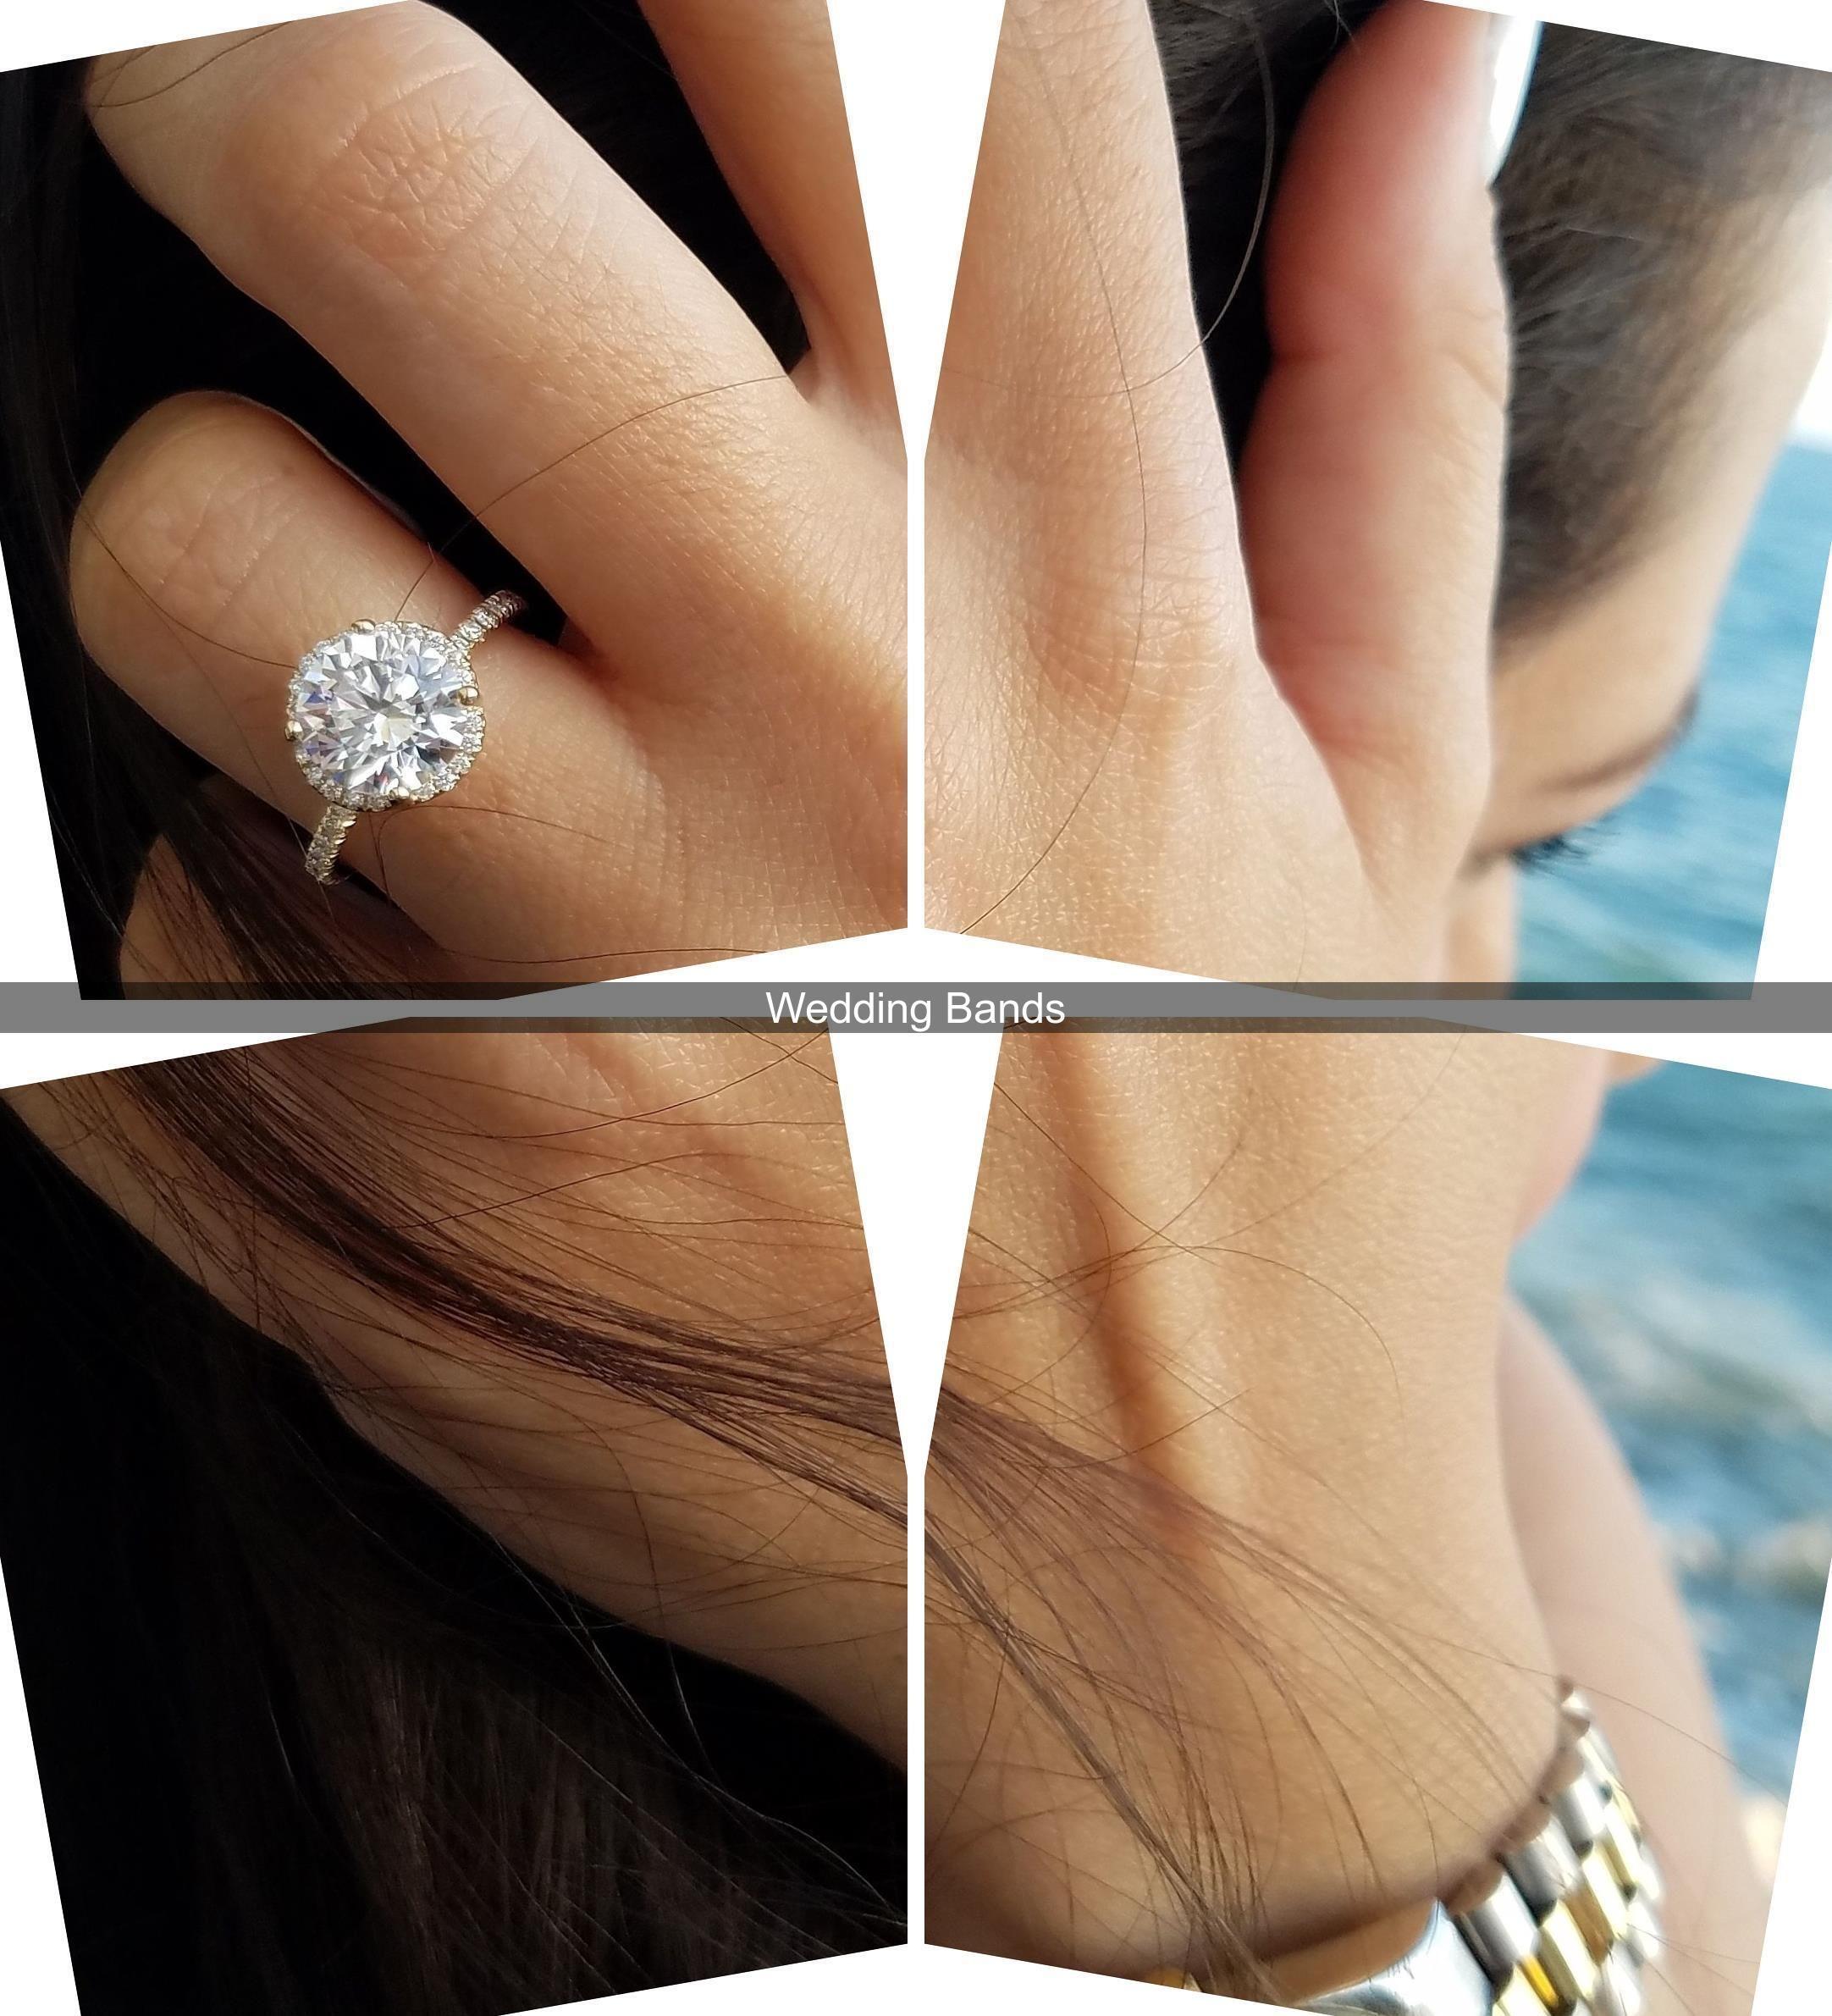 Single Diamond Engagement Ring Wedding Rings Online Wedding Bands And In 2020 Wedding Rings Online Single Diamond Engagement Ring Womens Engagement Rings